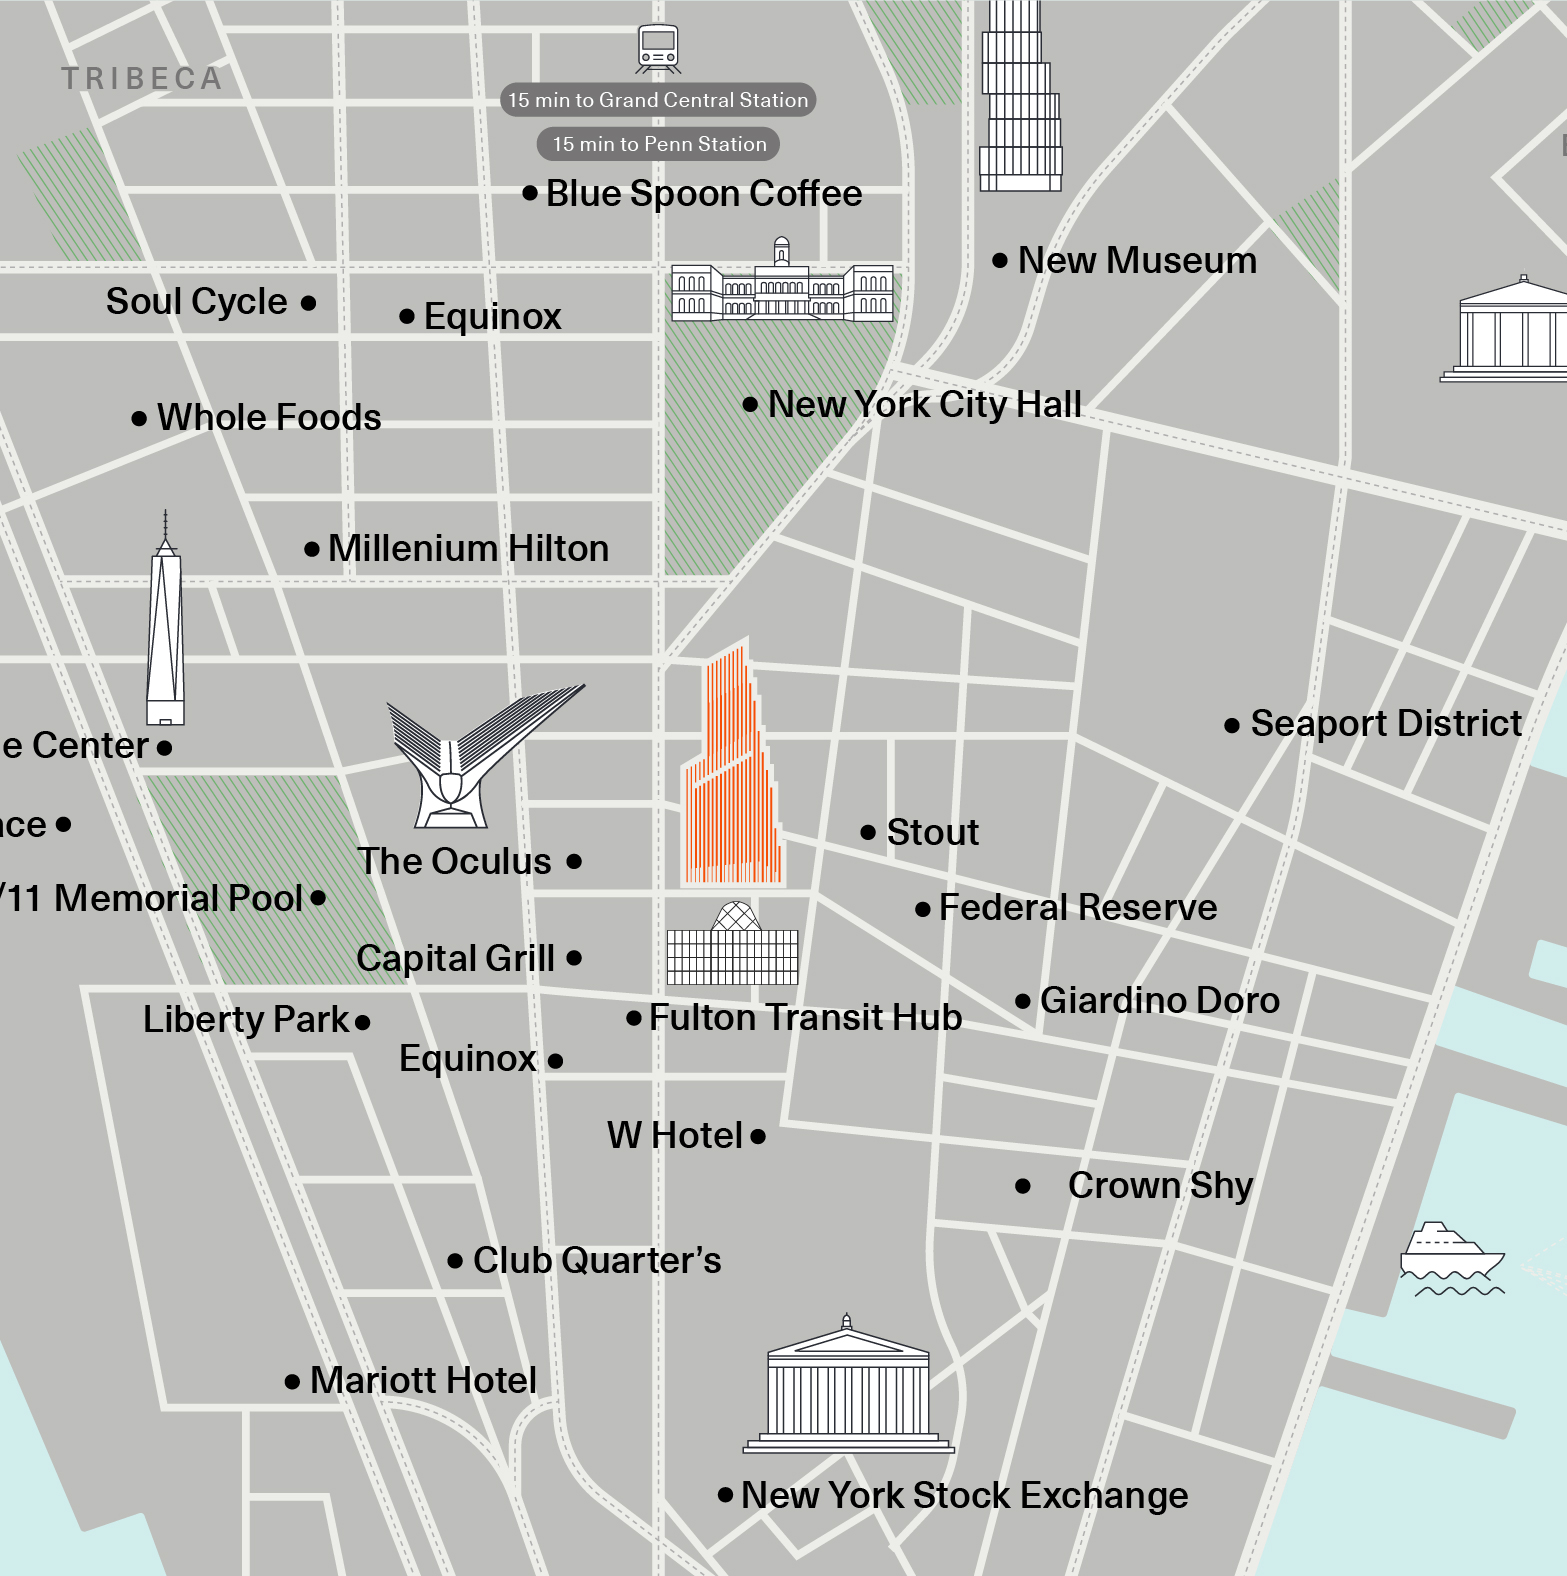 Downtown New York City Landmarks map - 222 Broadway